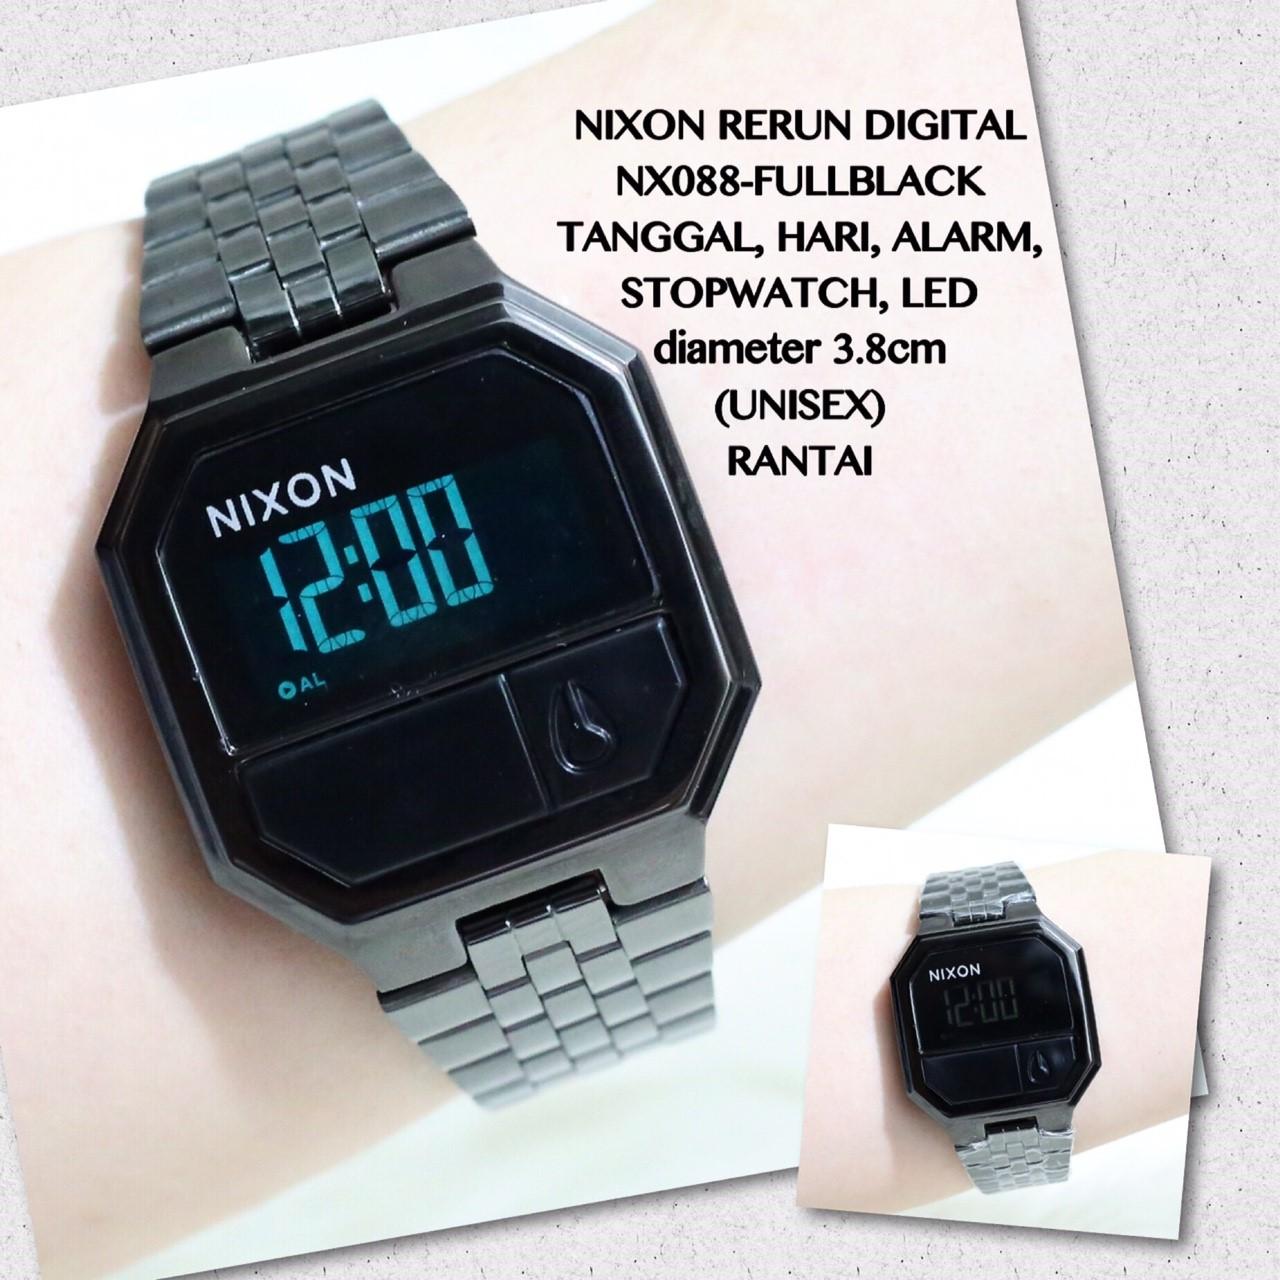 Jam tangan NIXON RERUN digital unisex alarm stopwatch rantai stainless